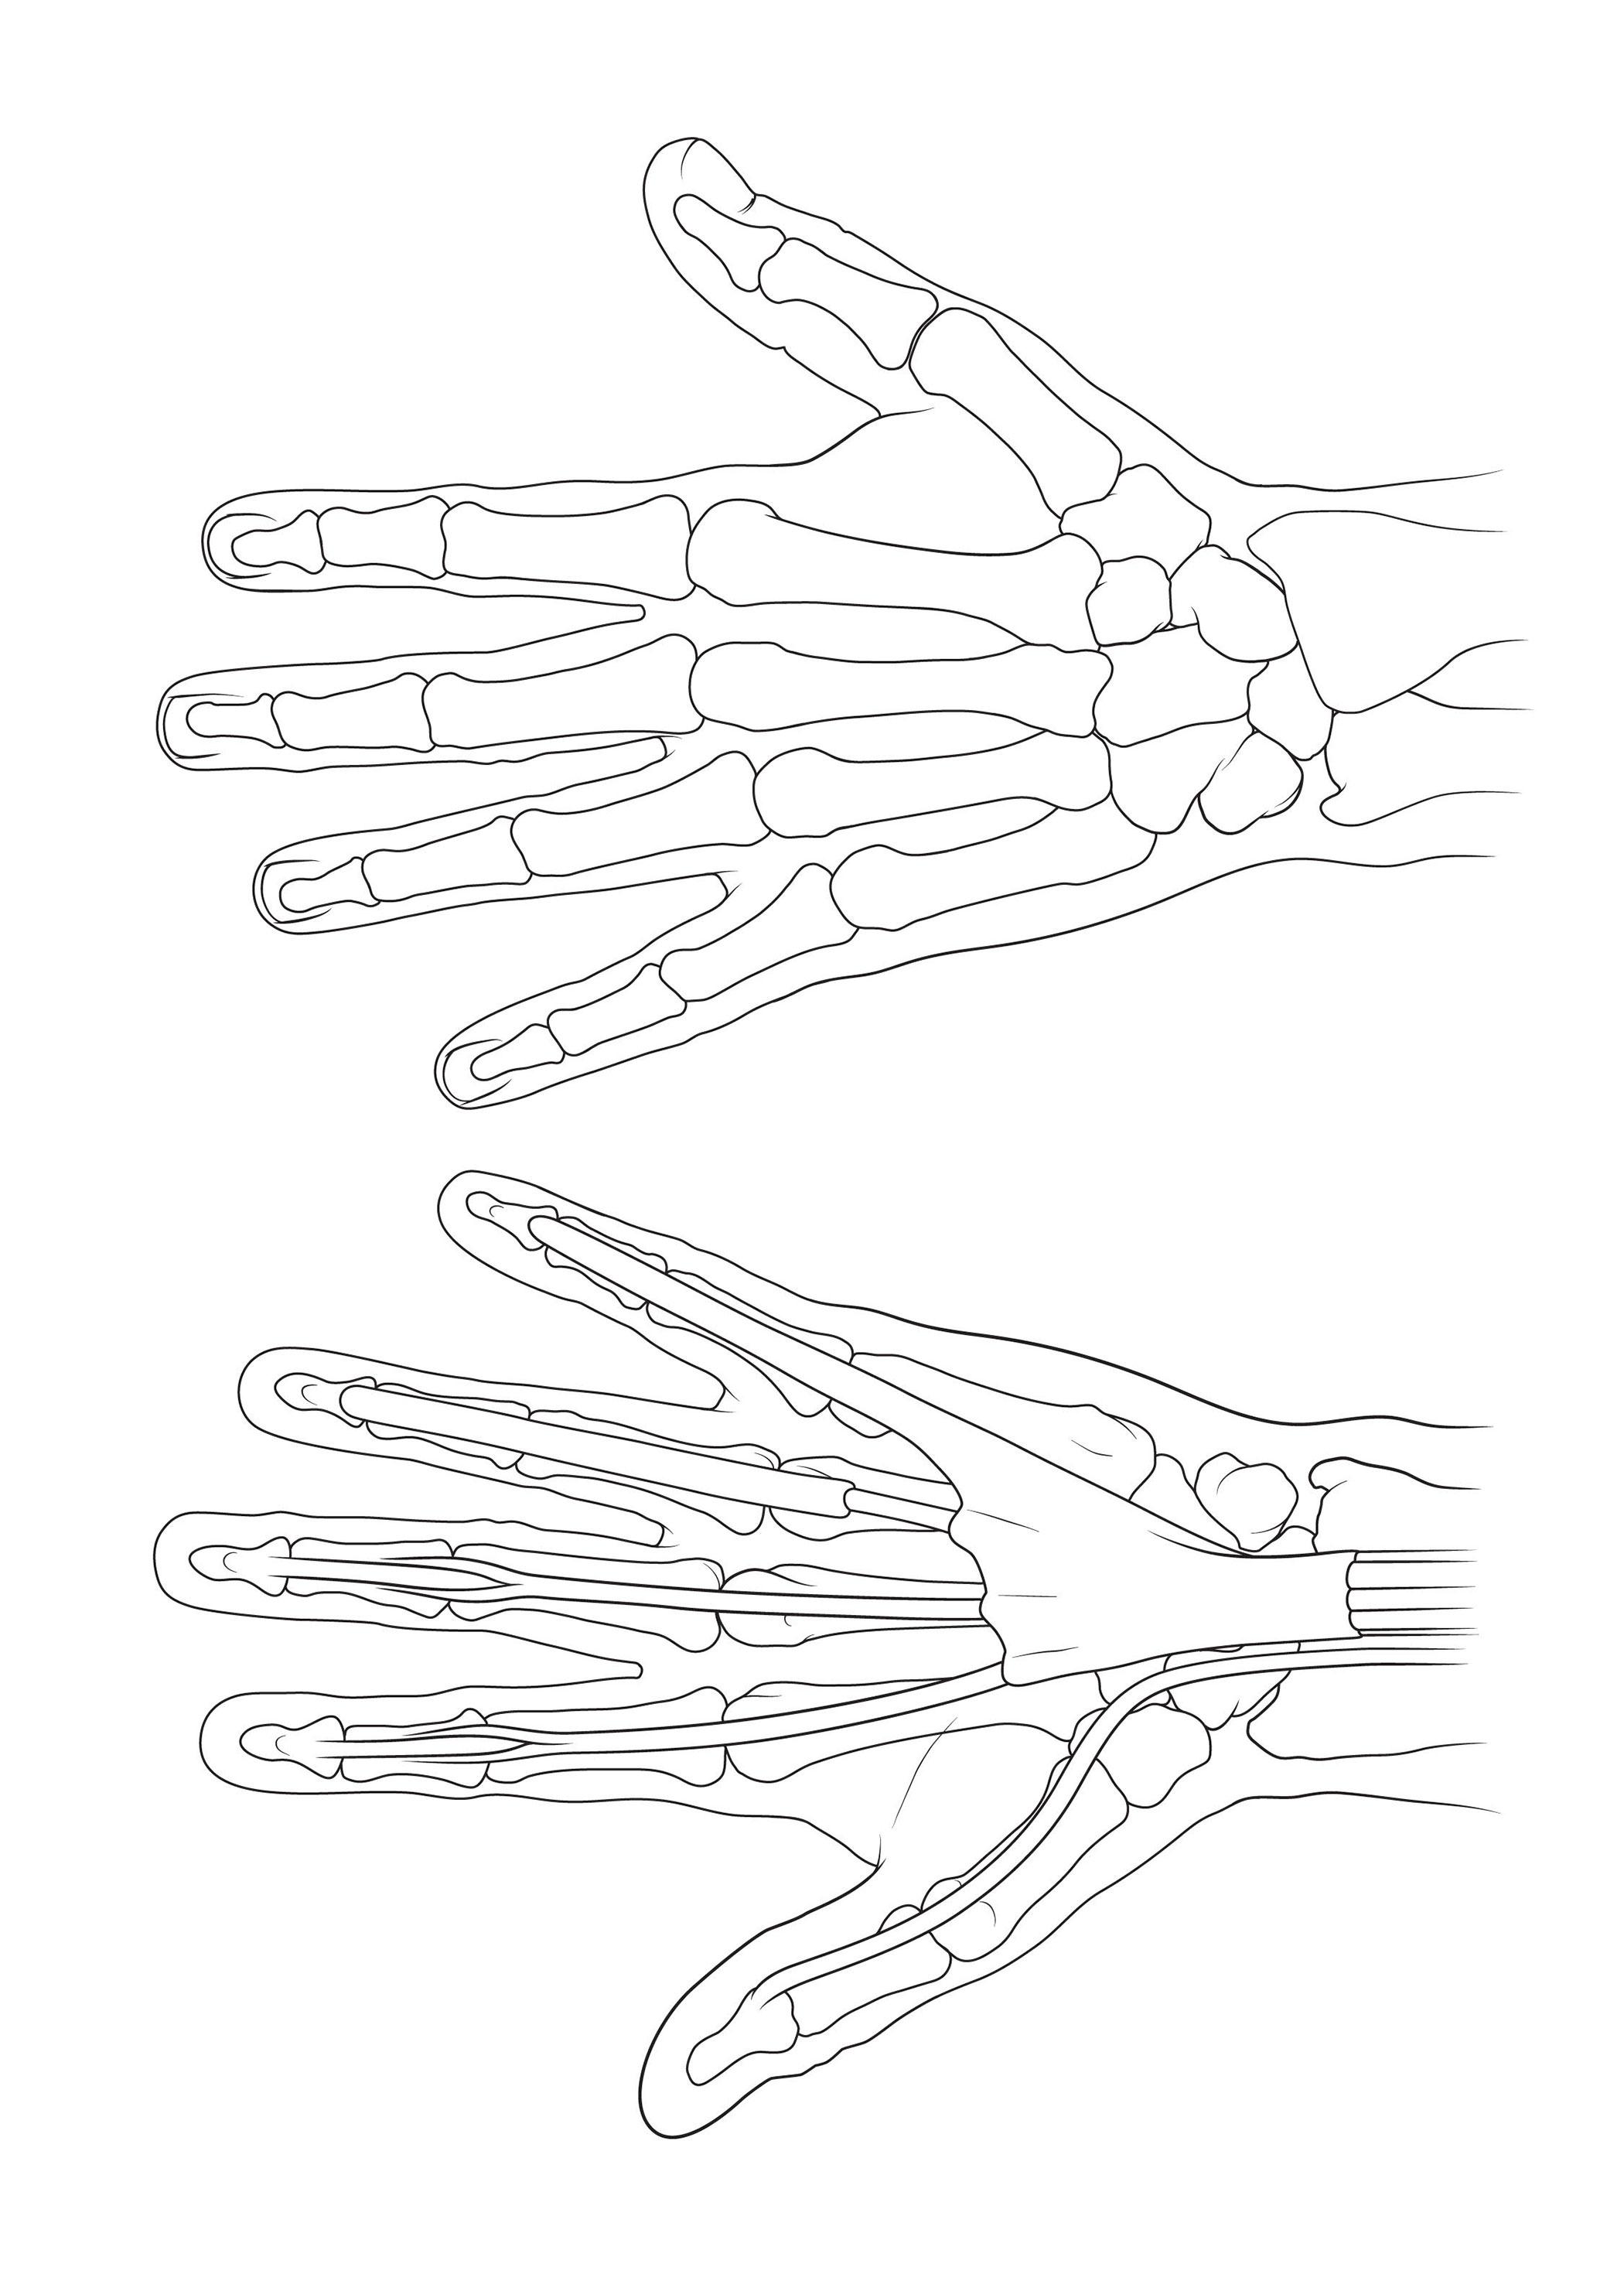 Bones Of The Hand Anatomy Sketch